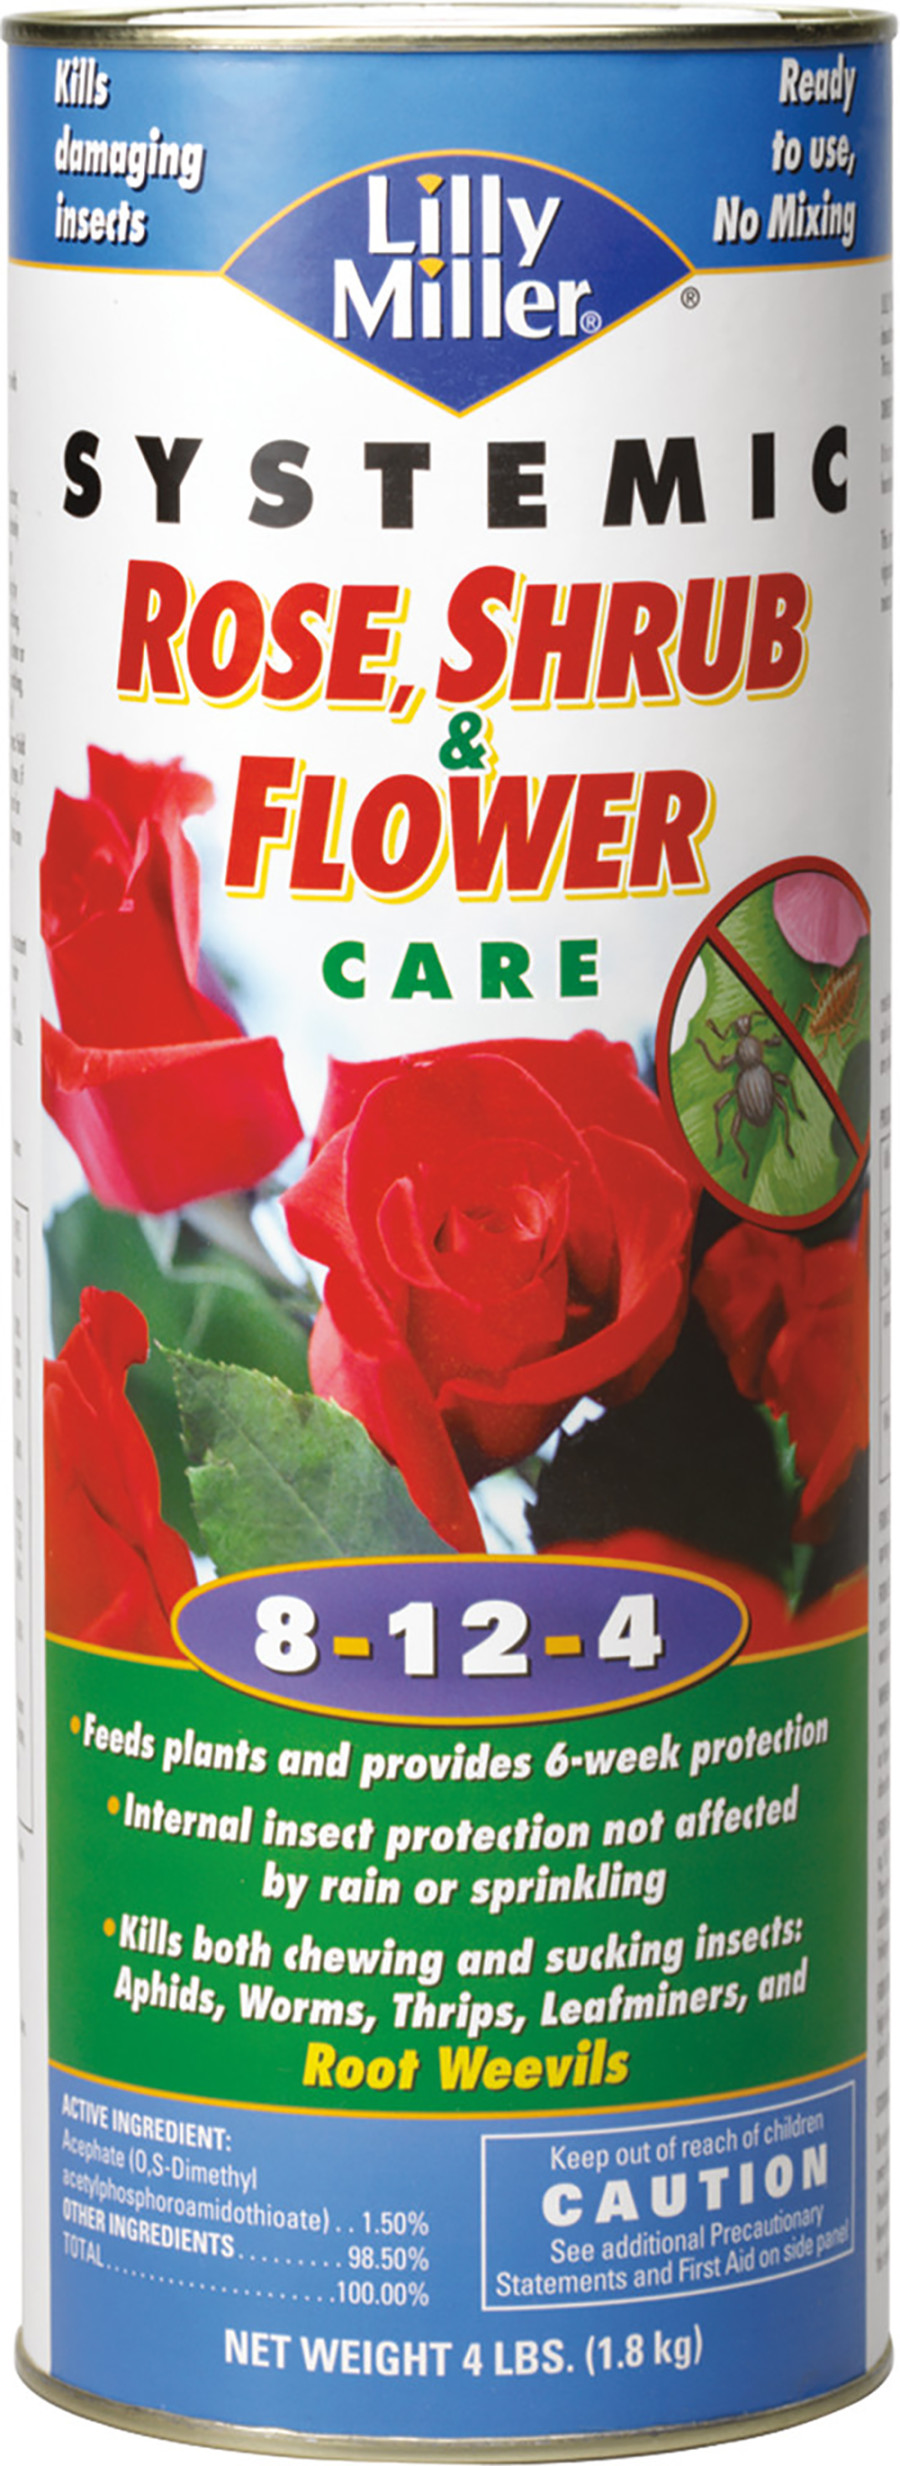 Lilly Miller Systemic Rose Shrub & Flower Care 8-12-4 6ea/4 lb